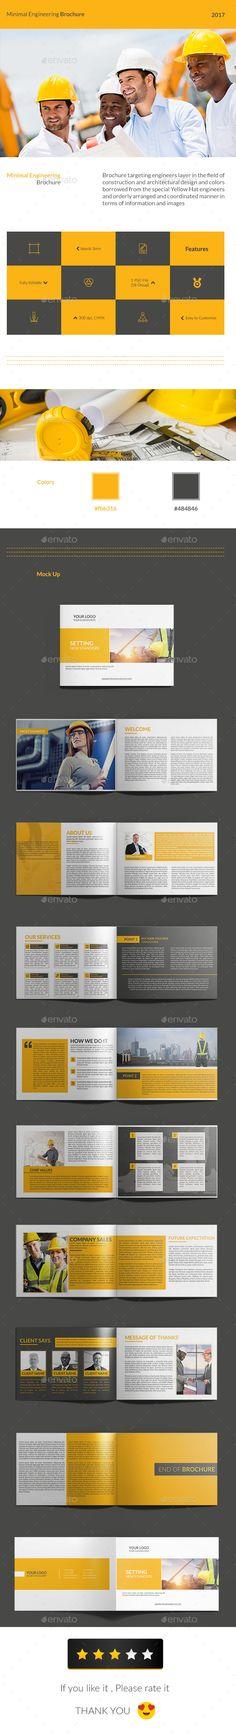 Minimal Engineering Brochure Design Template - Corporate Brochures Design Template PSD. Download here: https://graphicriver.net/item/minimal-engineering-brochure/19385241?ref=yinkira